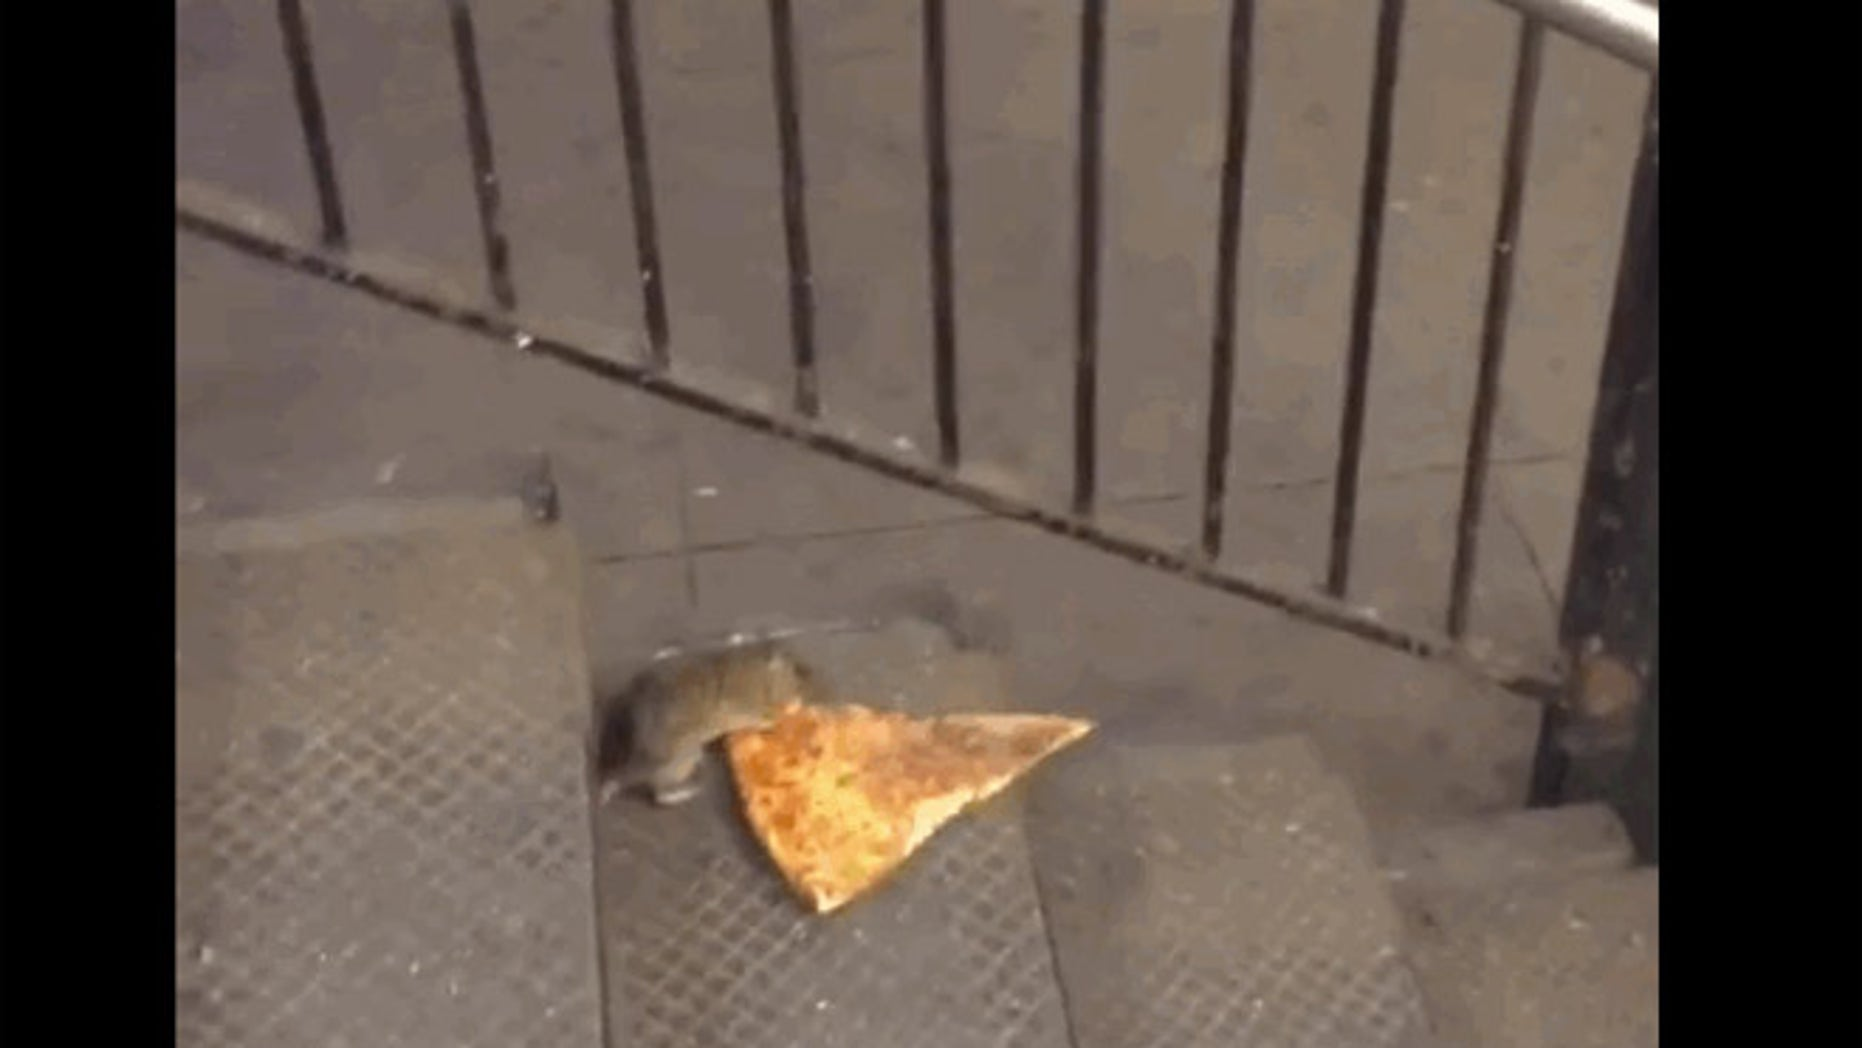 Behold Pizza rat.